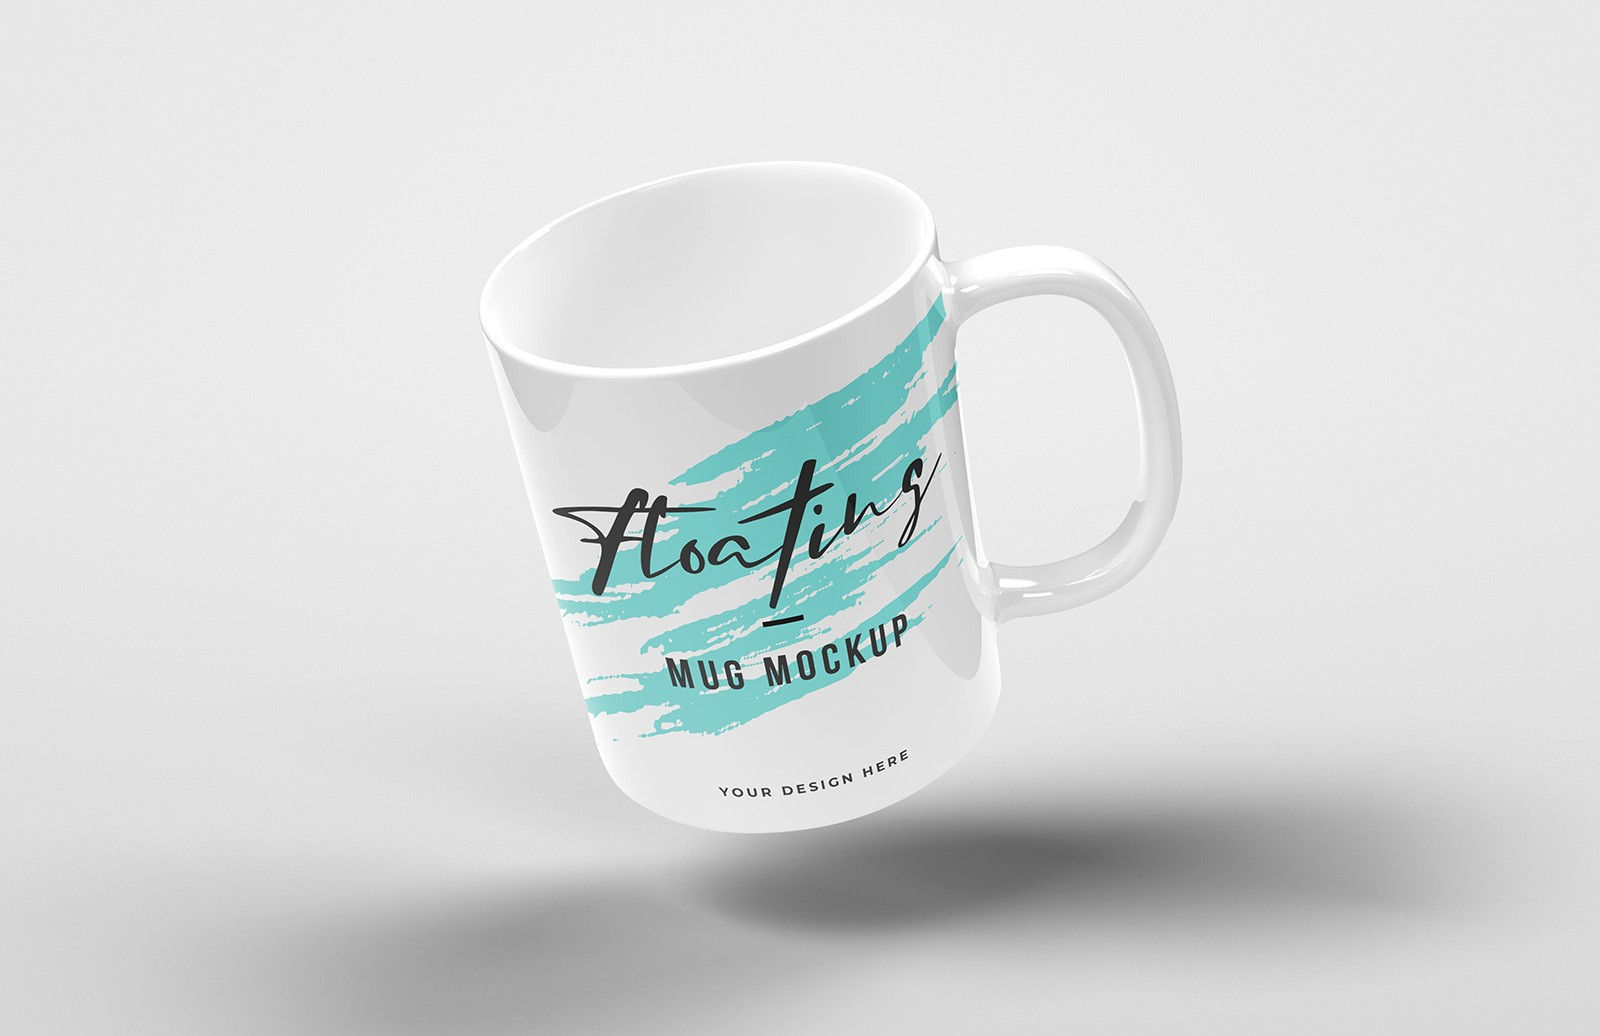 Floating Mug Mockup Preview 1